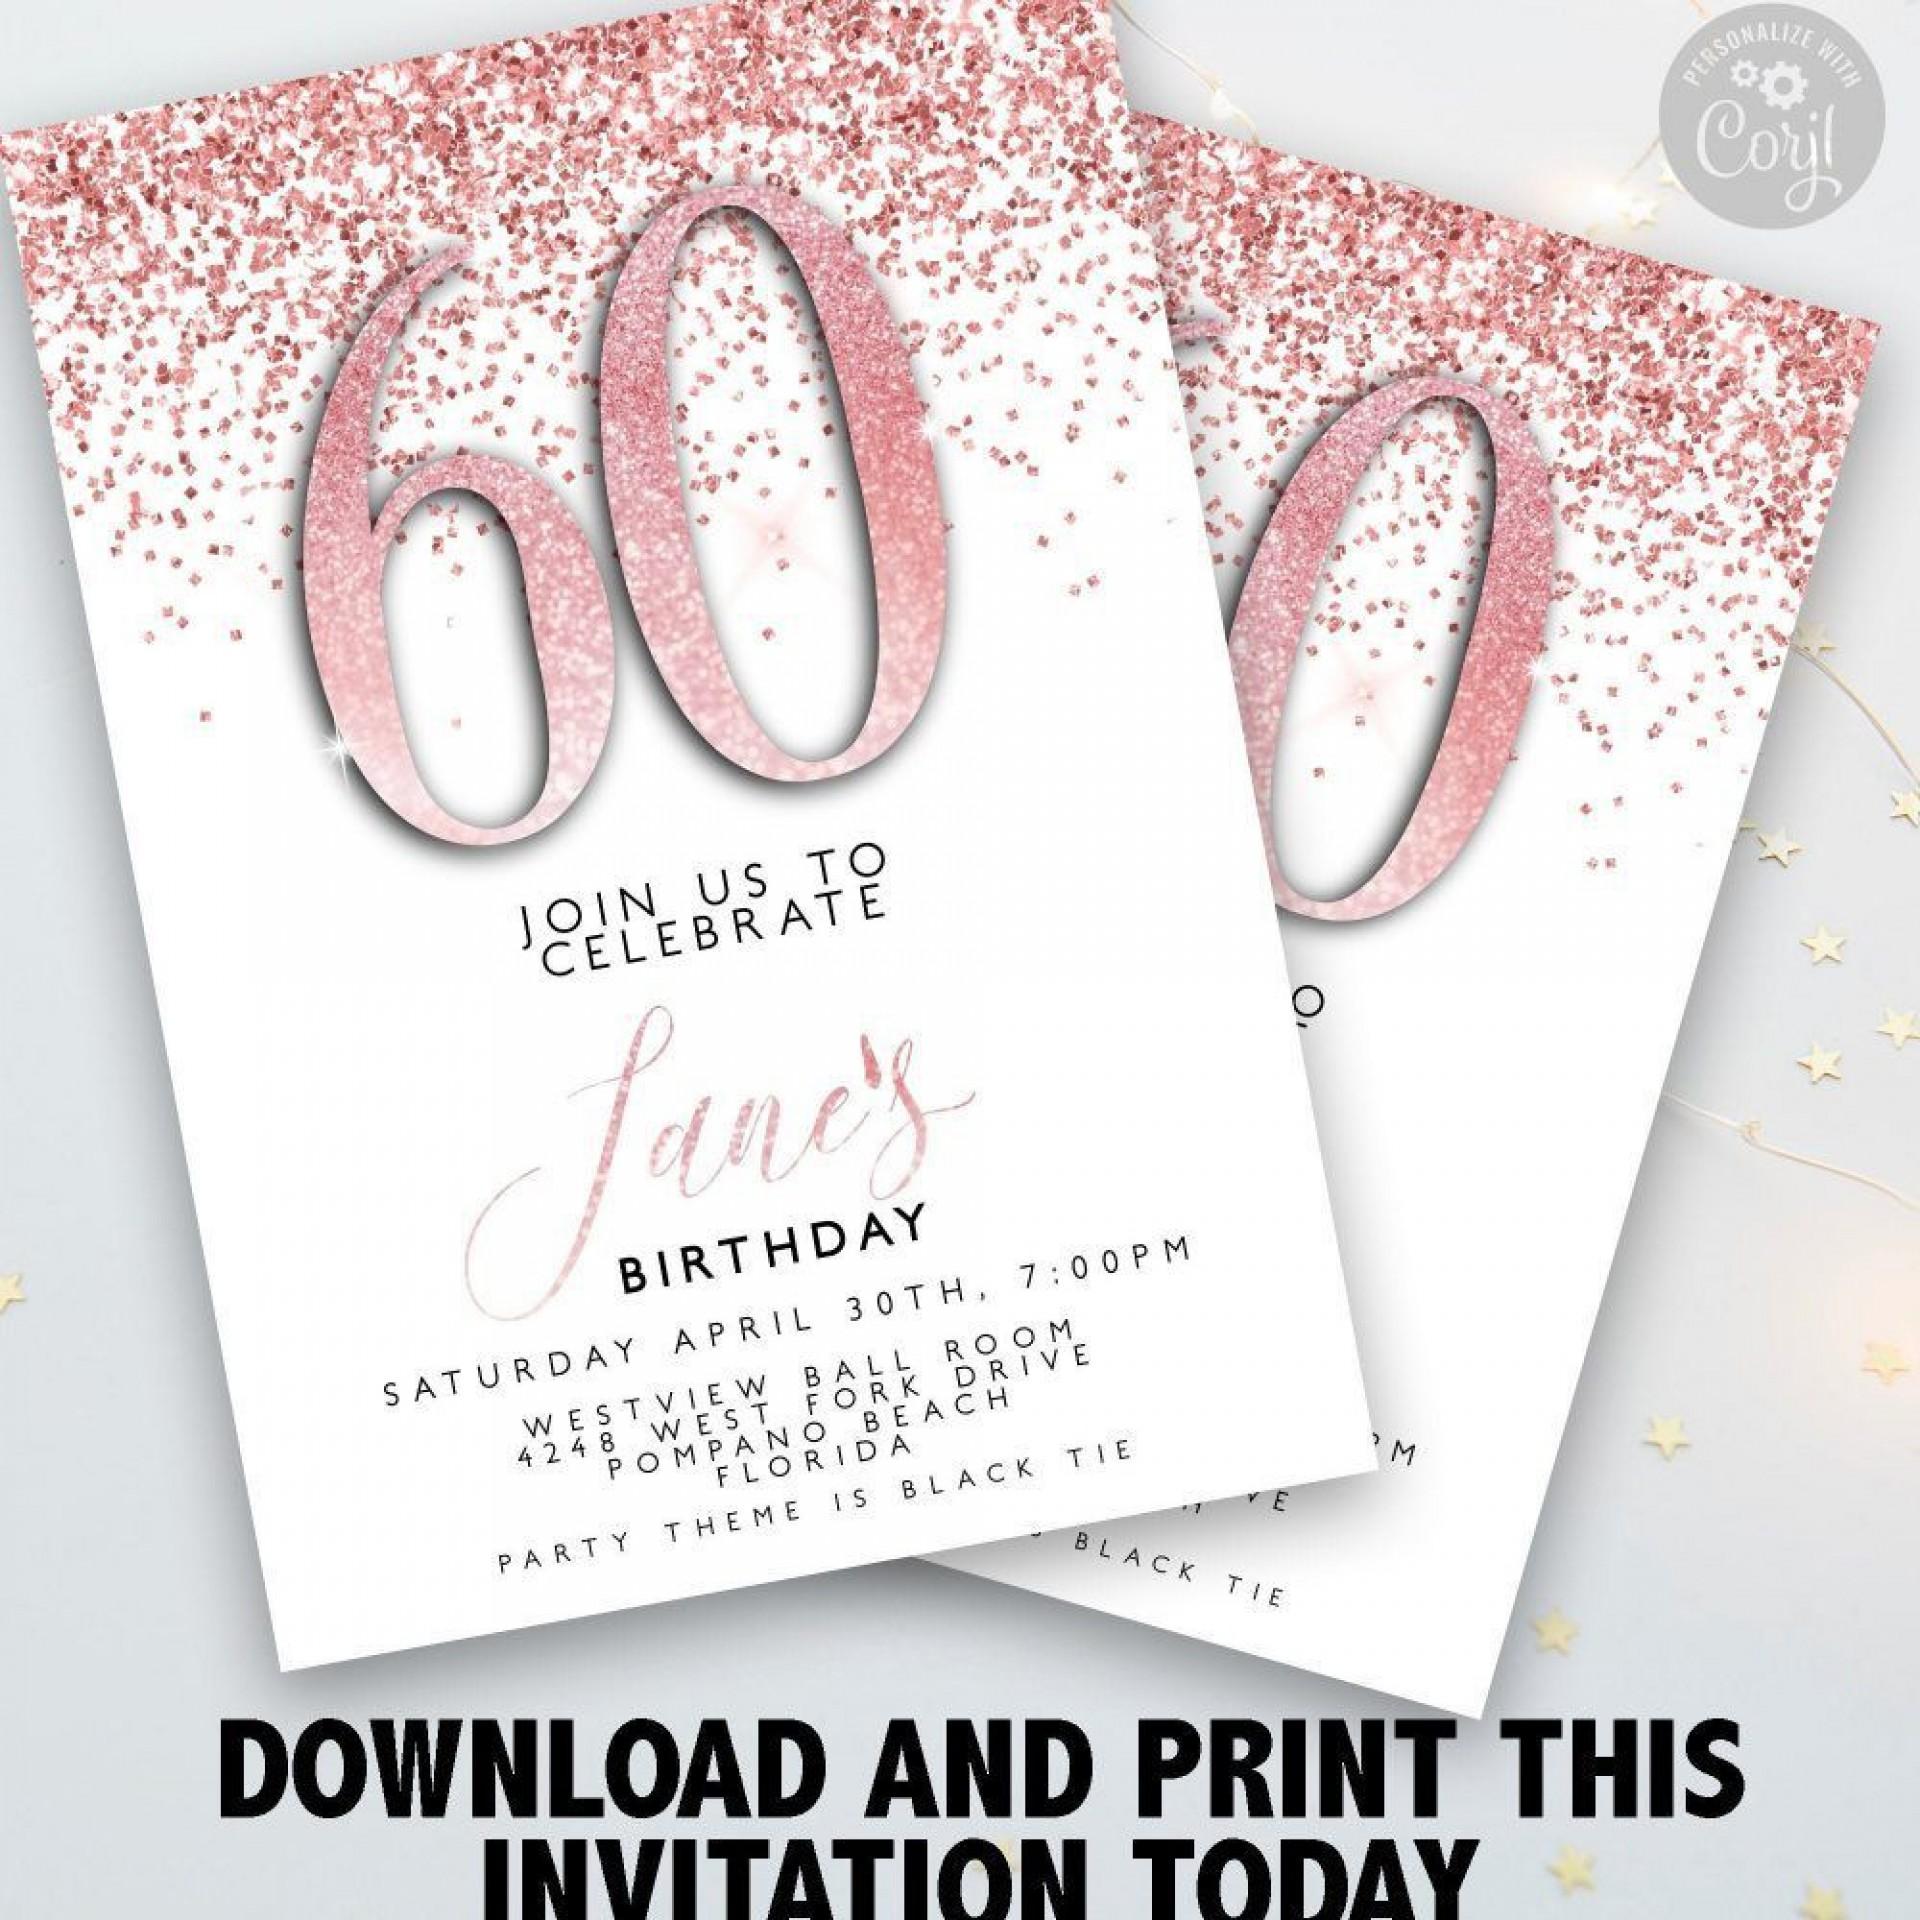 004 Stupendou 60 Birthday Invite Template Highest Quality  Templates 60th Printable Free1920